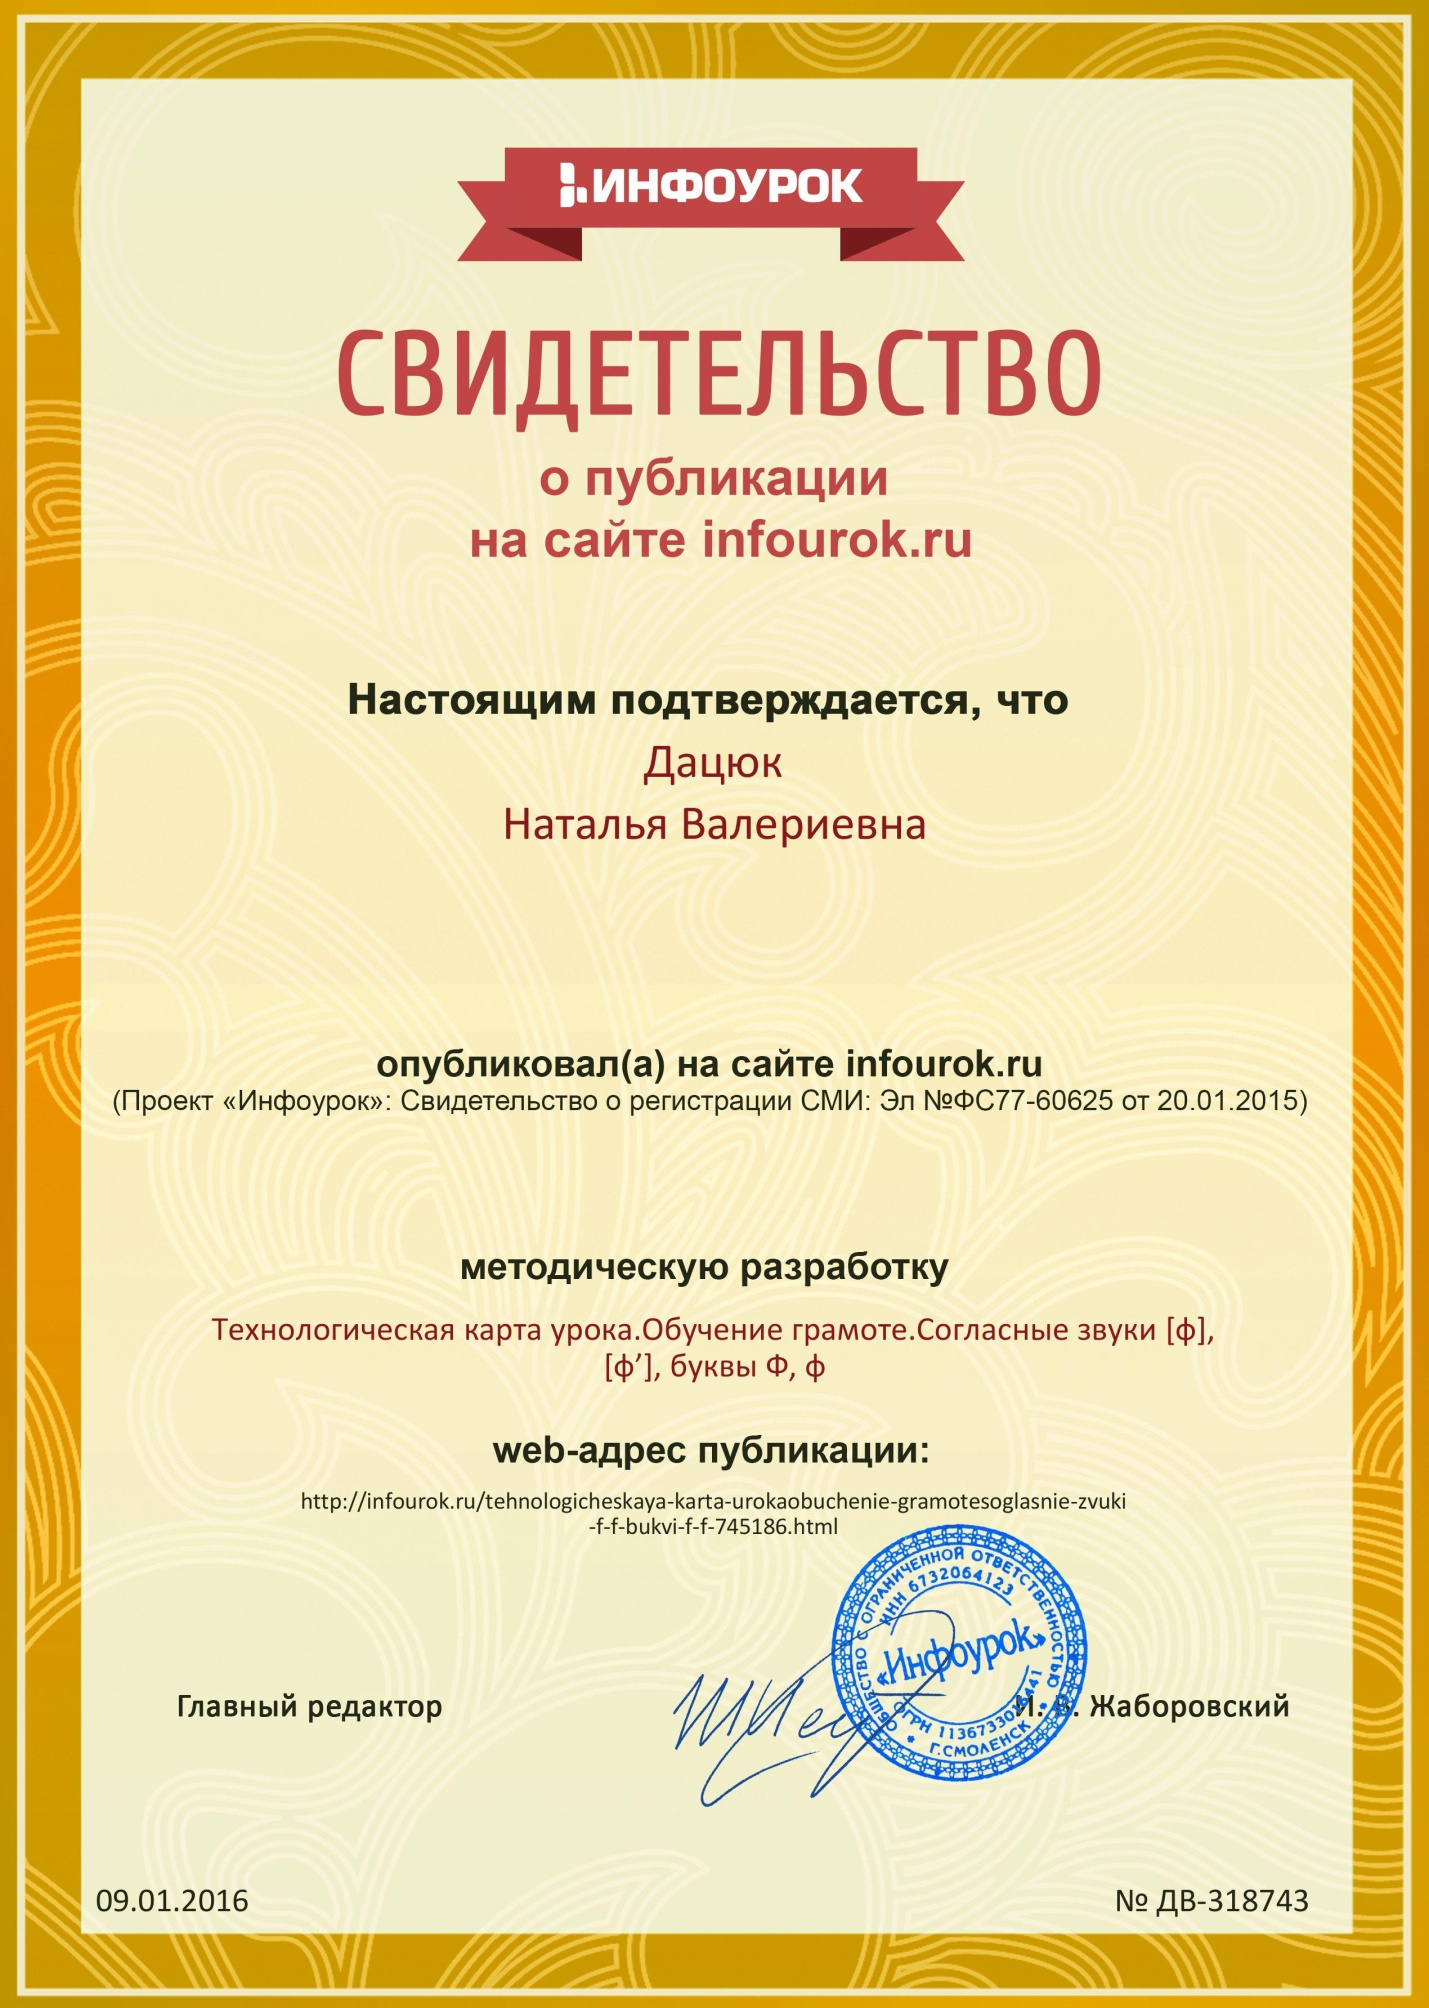 Сертификат проекта infourok.ru № ДВ-318743.jpg